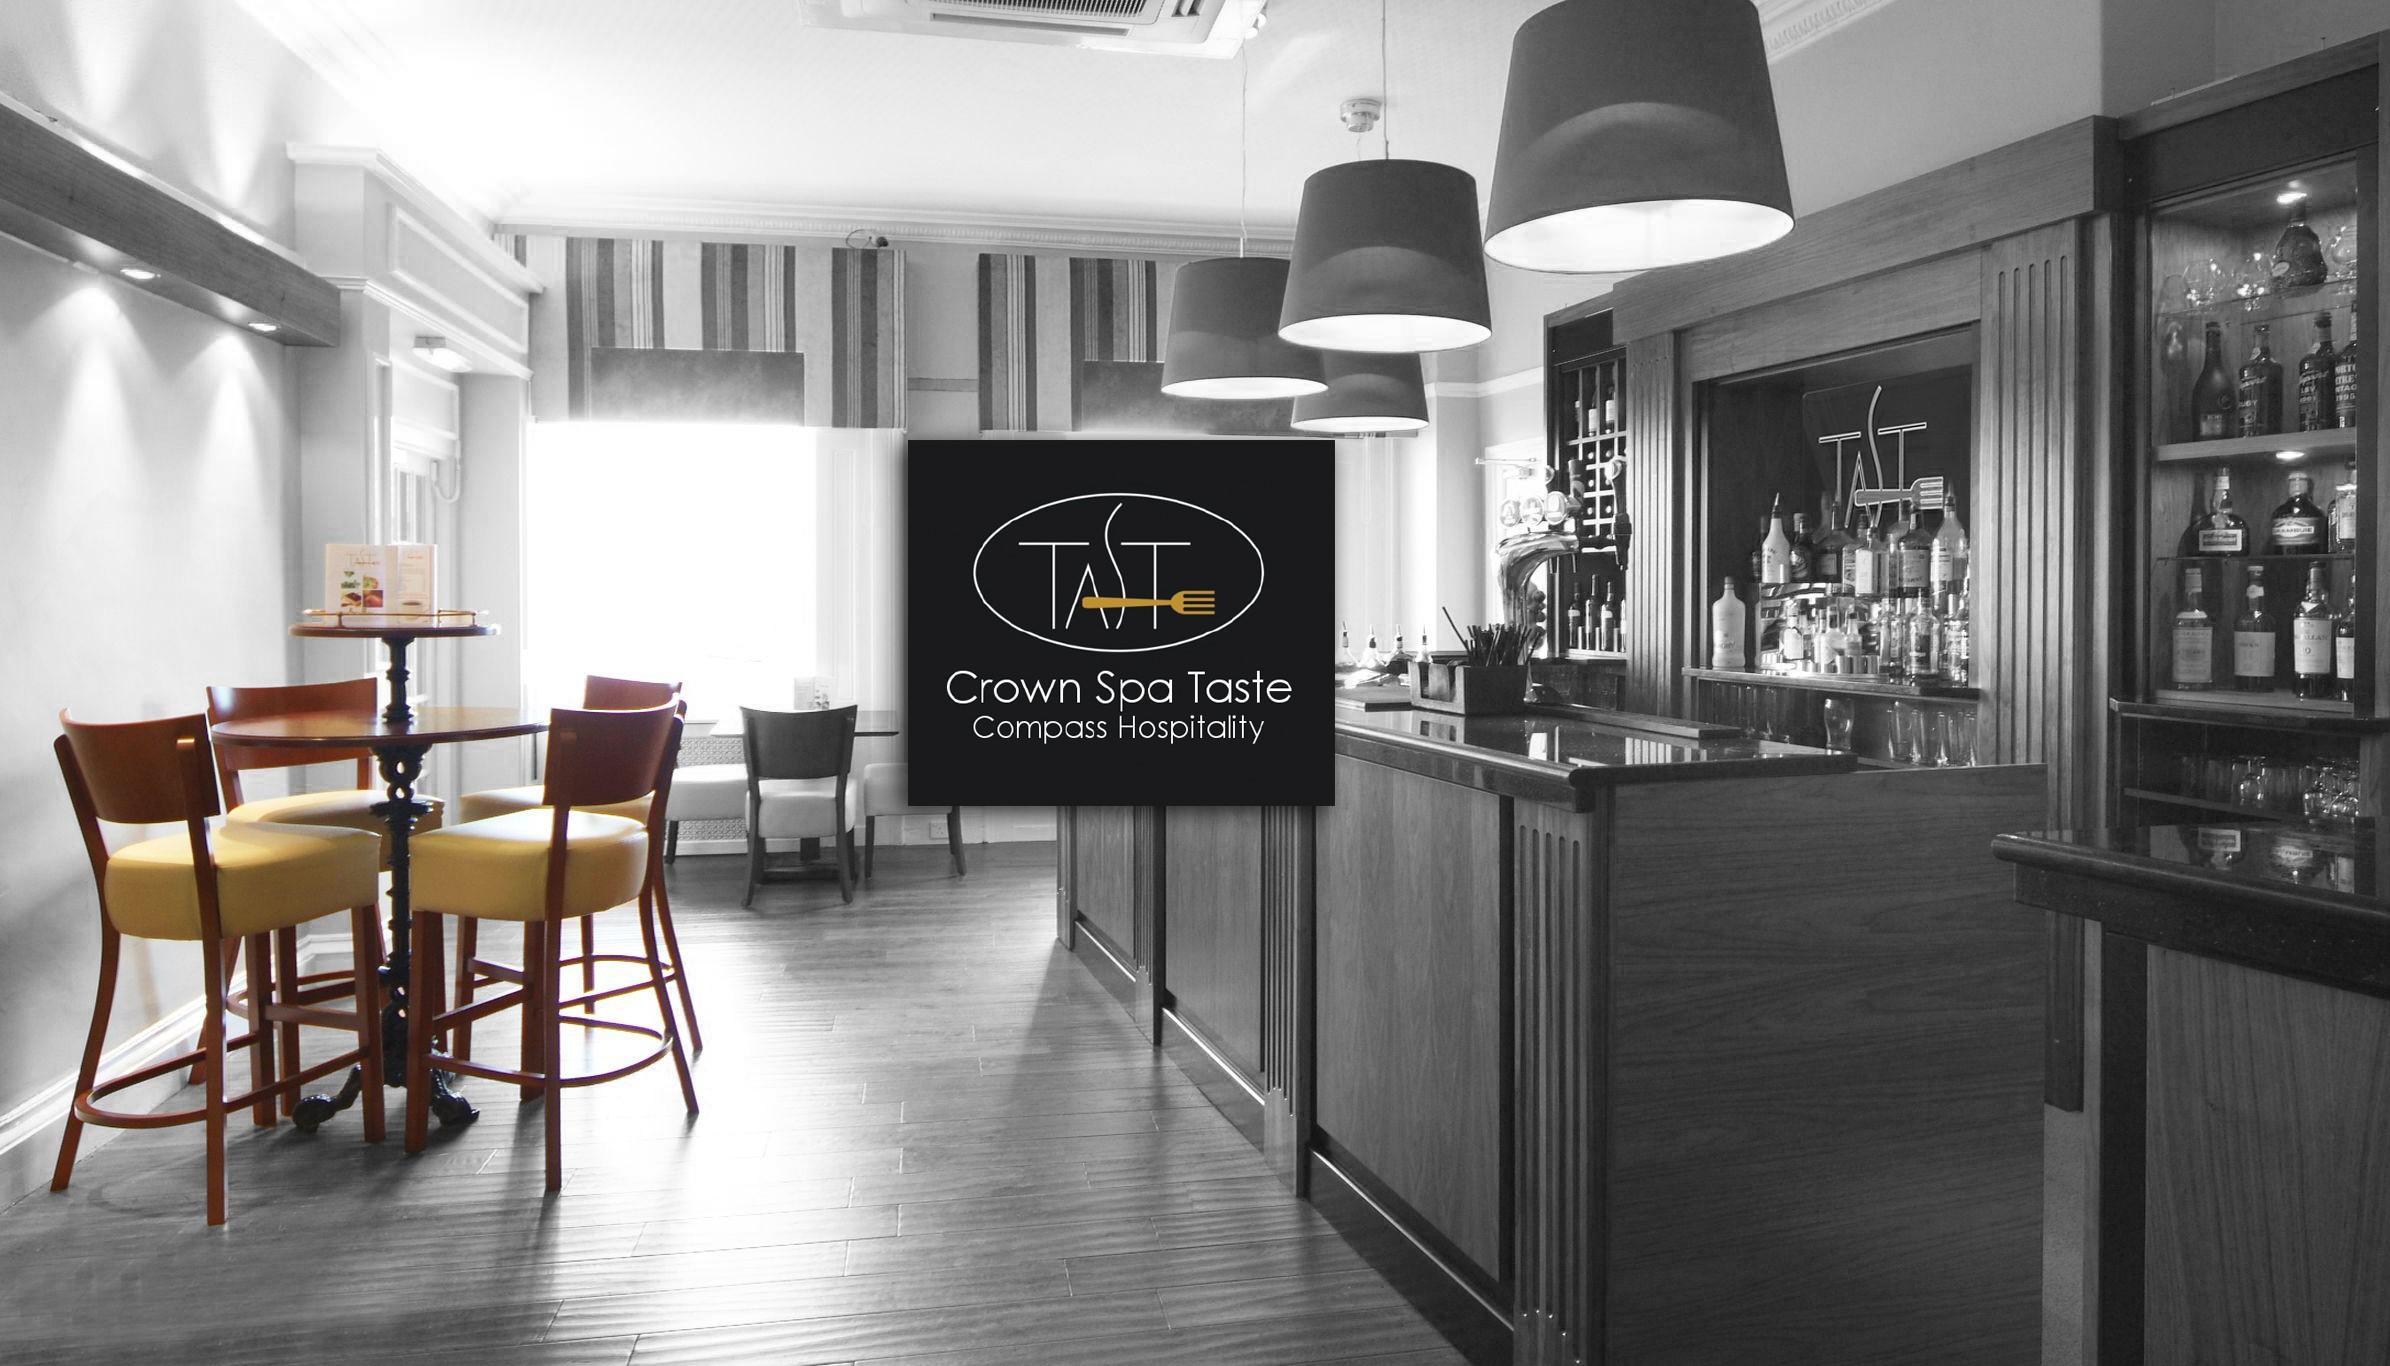 TASTE RESTAURANT by Compass Dining, Scarborough, United Kingdom